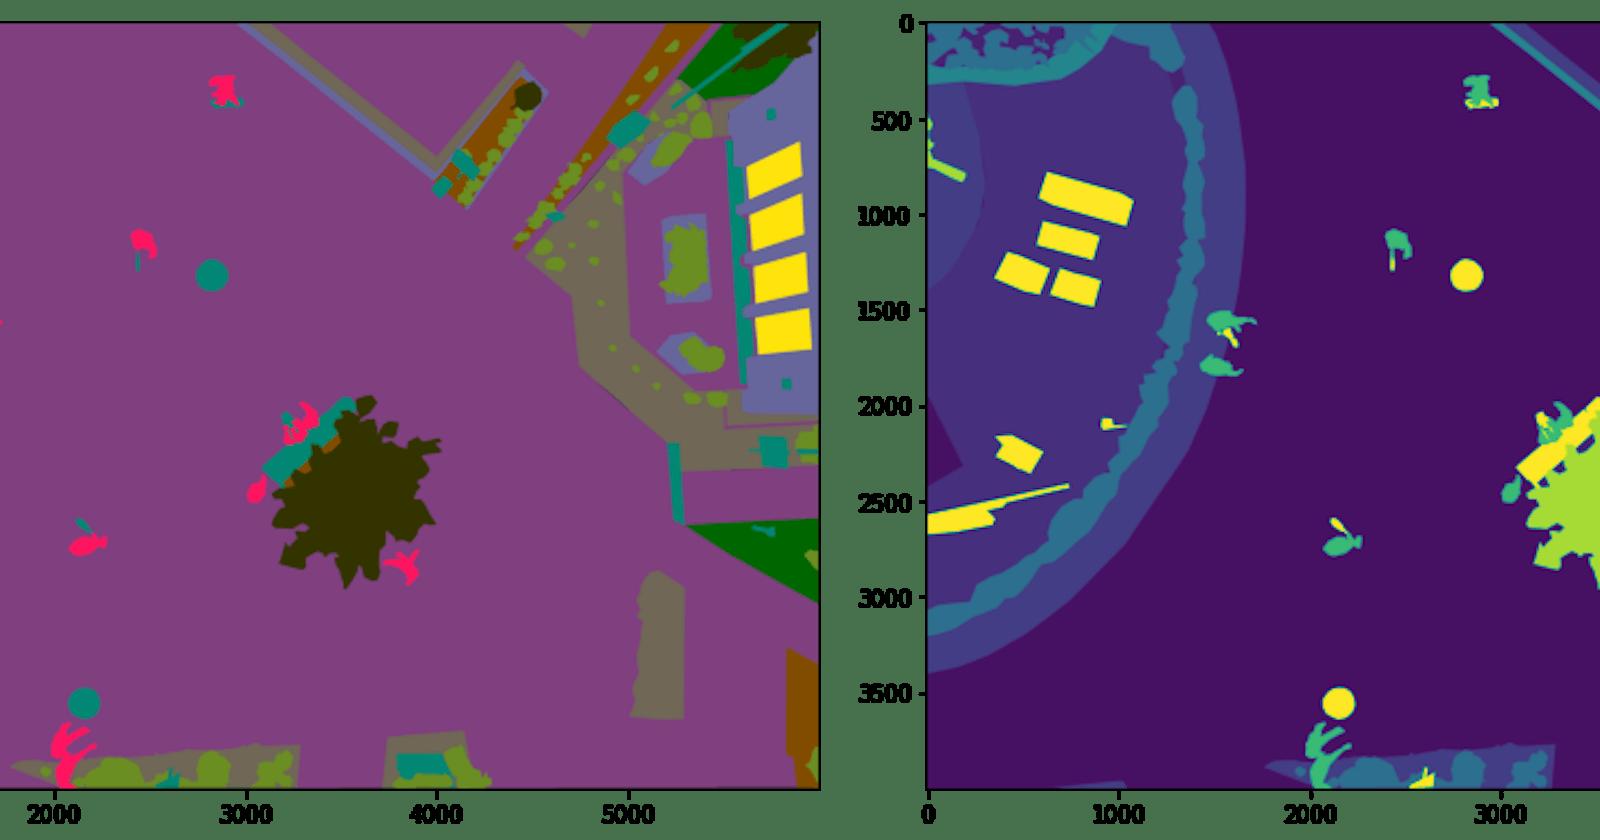 Preprocessing RGB image Masks to Segmentation Masks